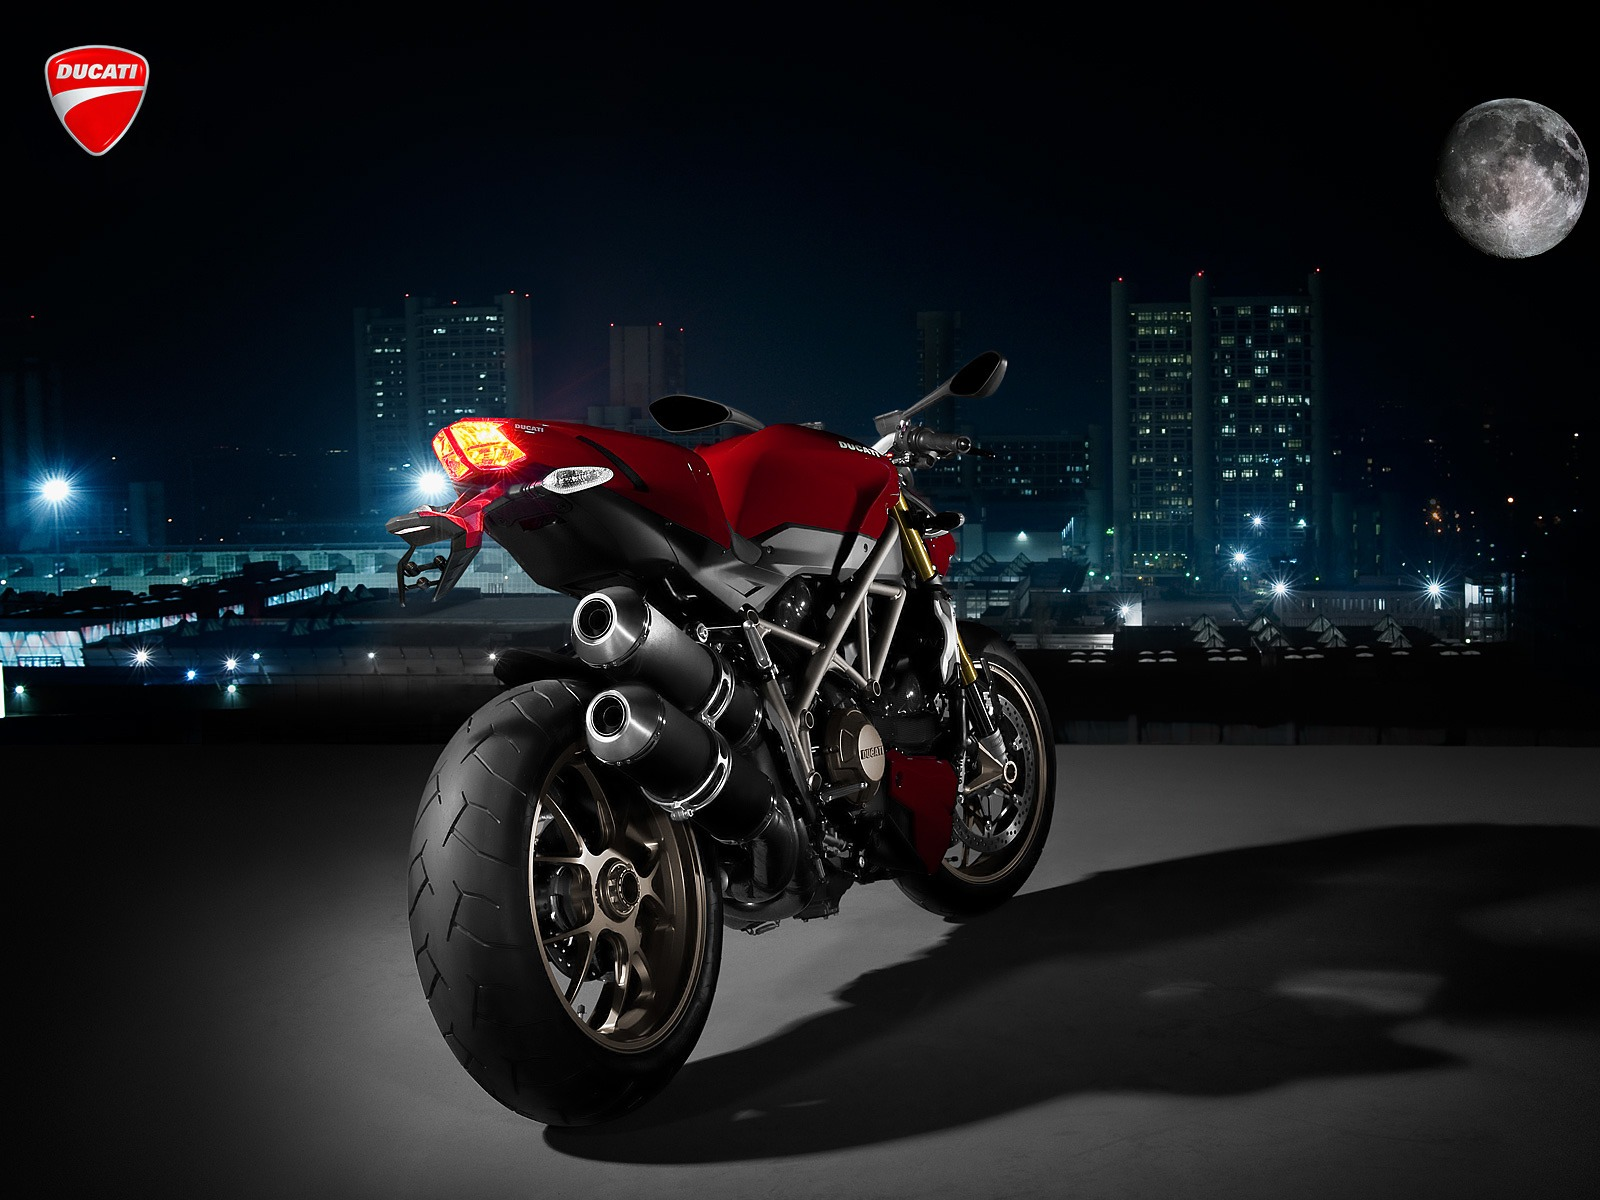 Ducati Motorcycles